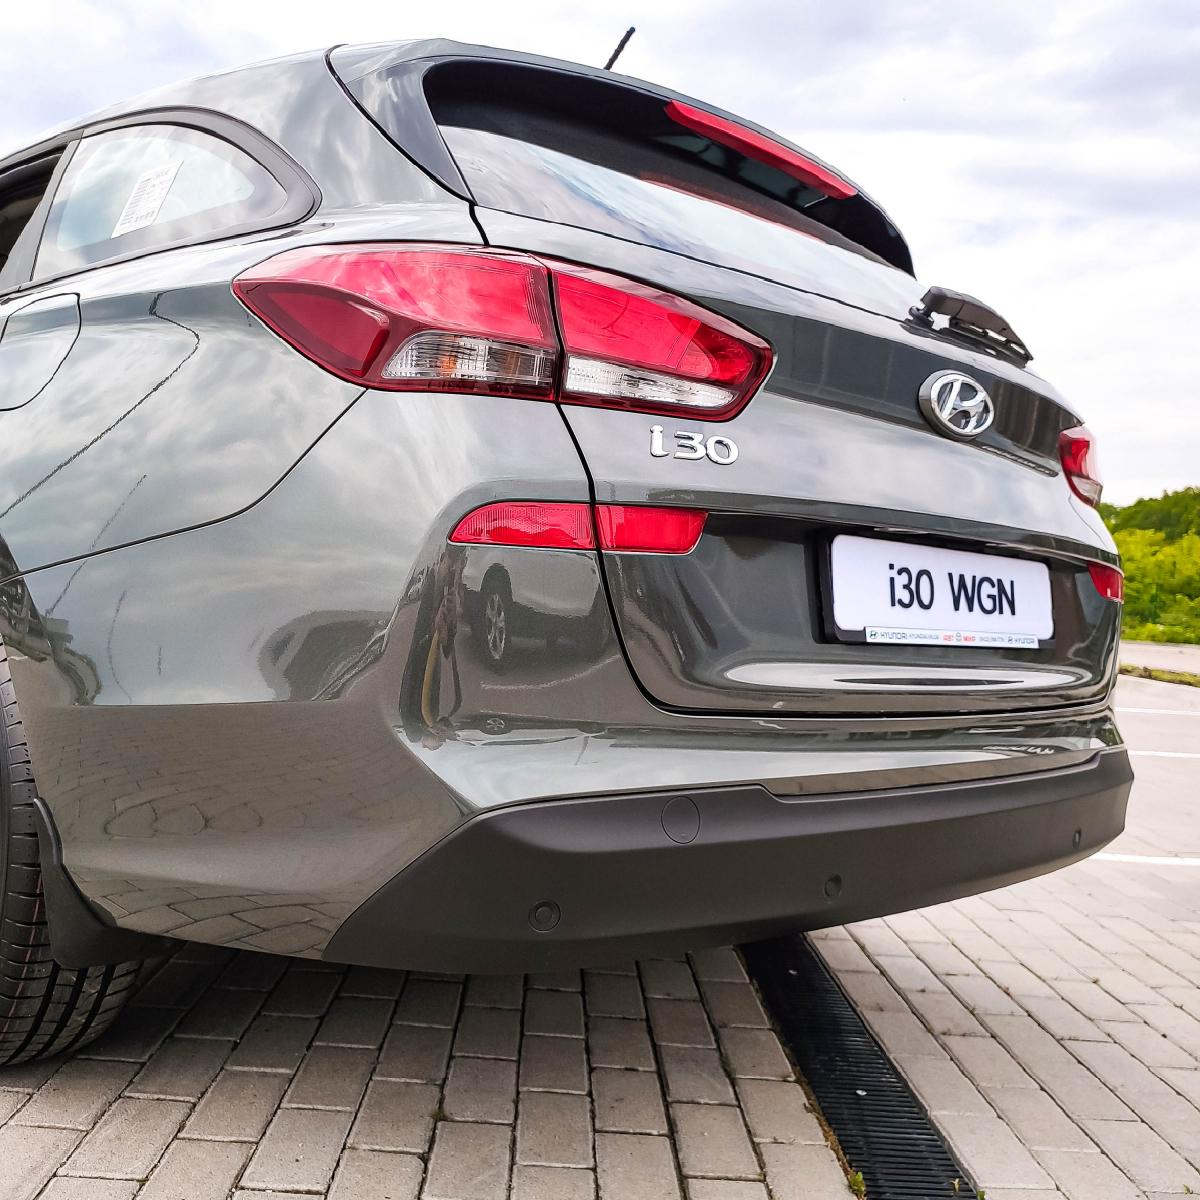 Спеціальна вигода на придбання Hyundai i30 WGN! | Хюндай Мотор Україна - фото 14